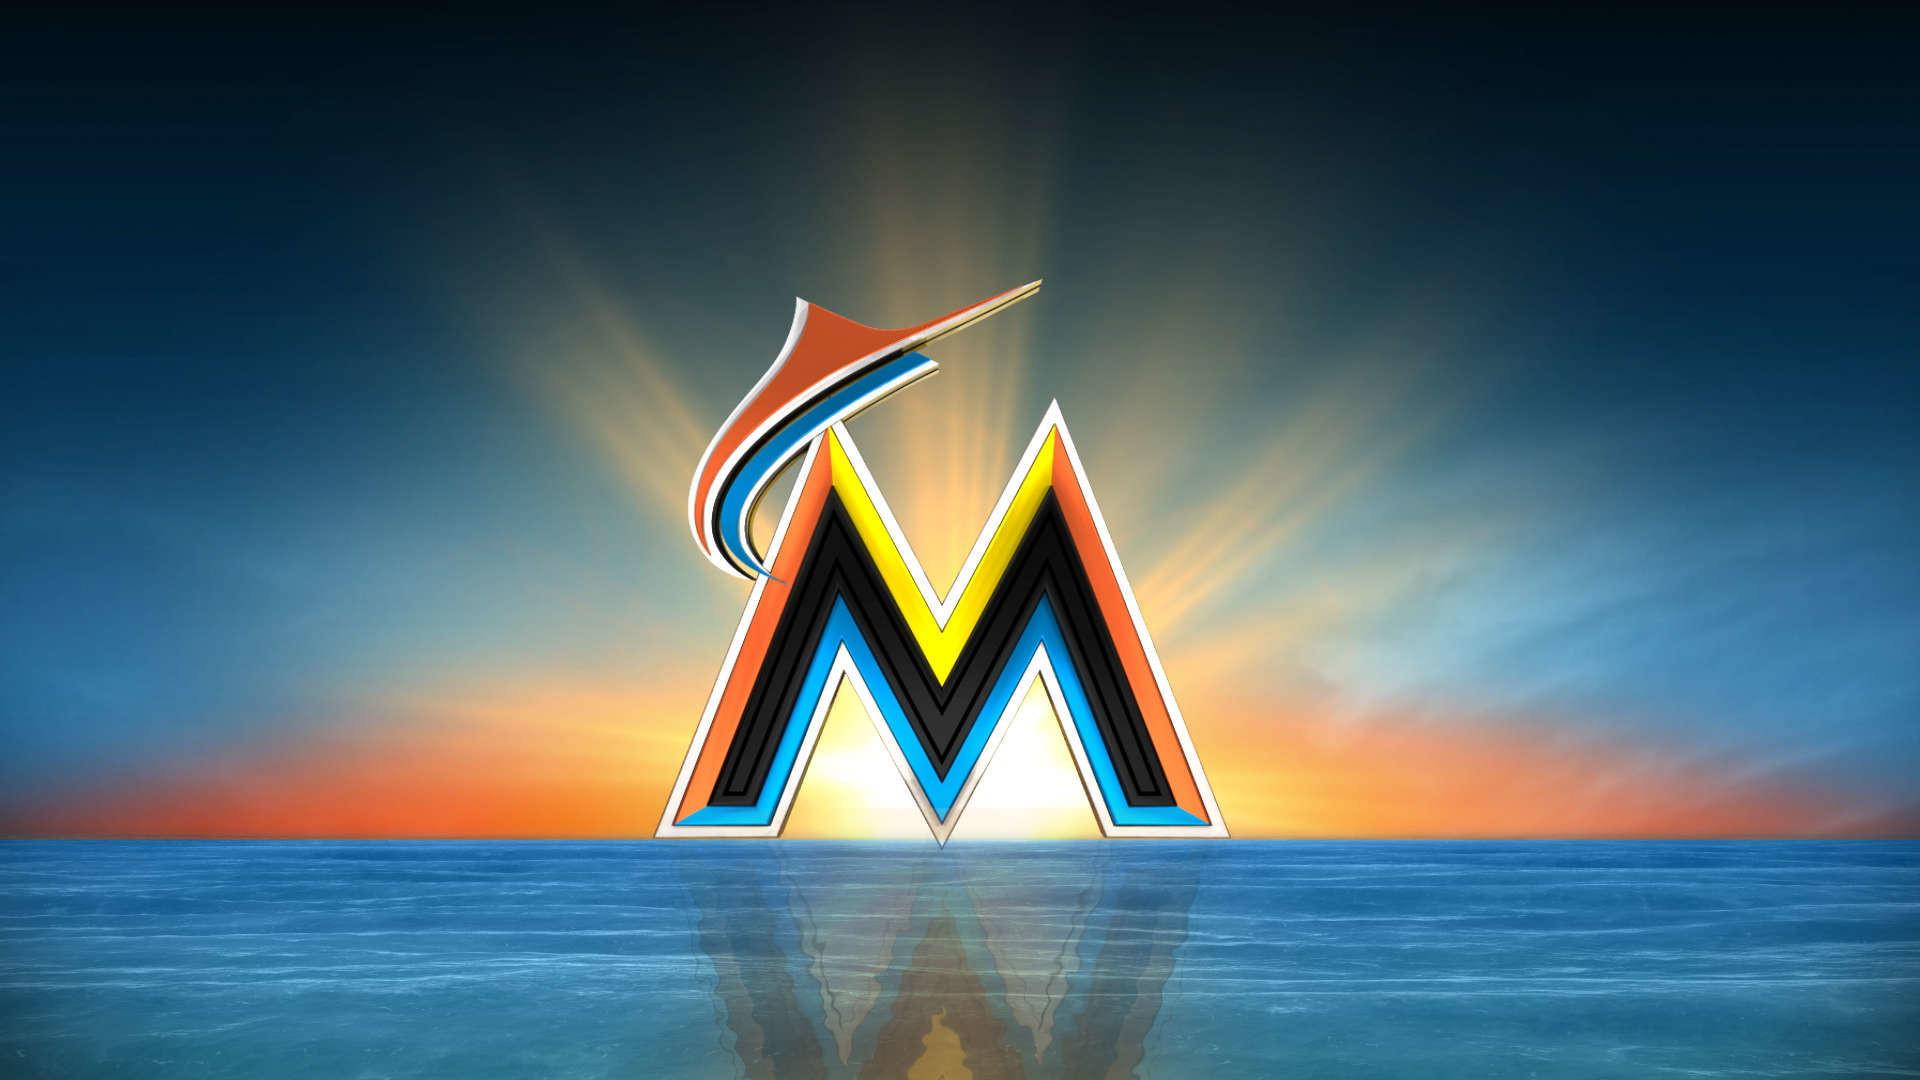 Download now: Miami Marlins Logo HD Wallpaper. Read description info's .